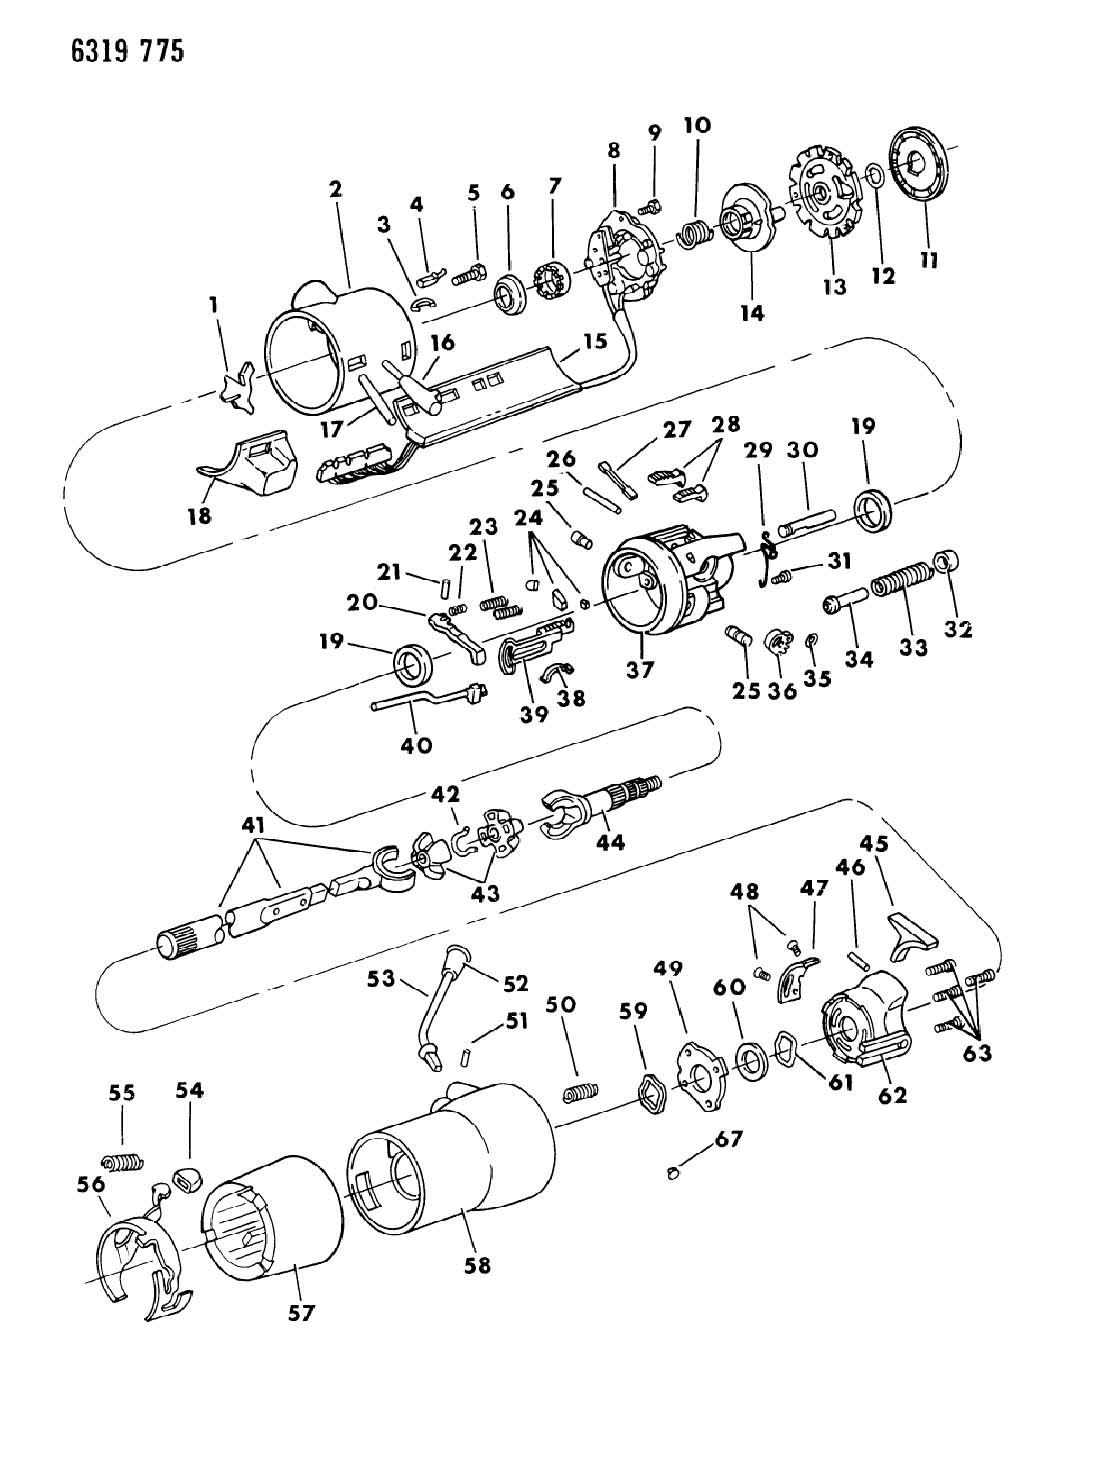 HP PartList furthermore TCPARFM116 also 2002 Dodge Ram 1500 Brake Light Wiring Diagram moreover 50504 moreover 516577019738282274. on ram roll bar